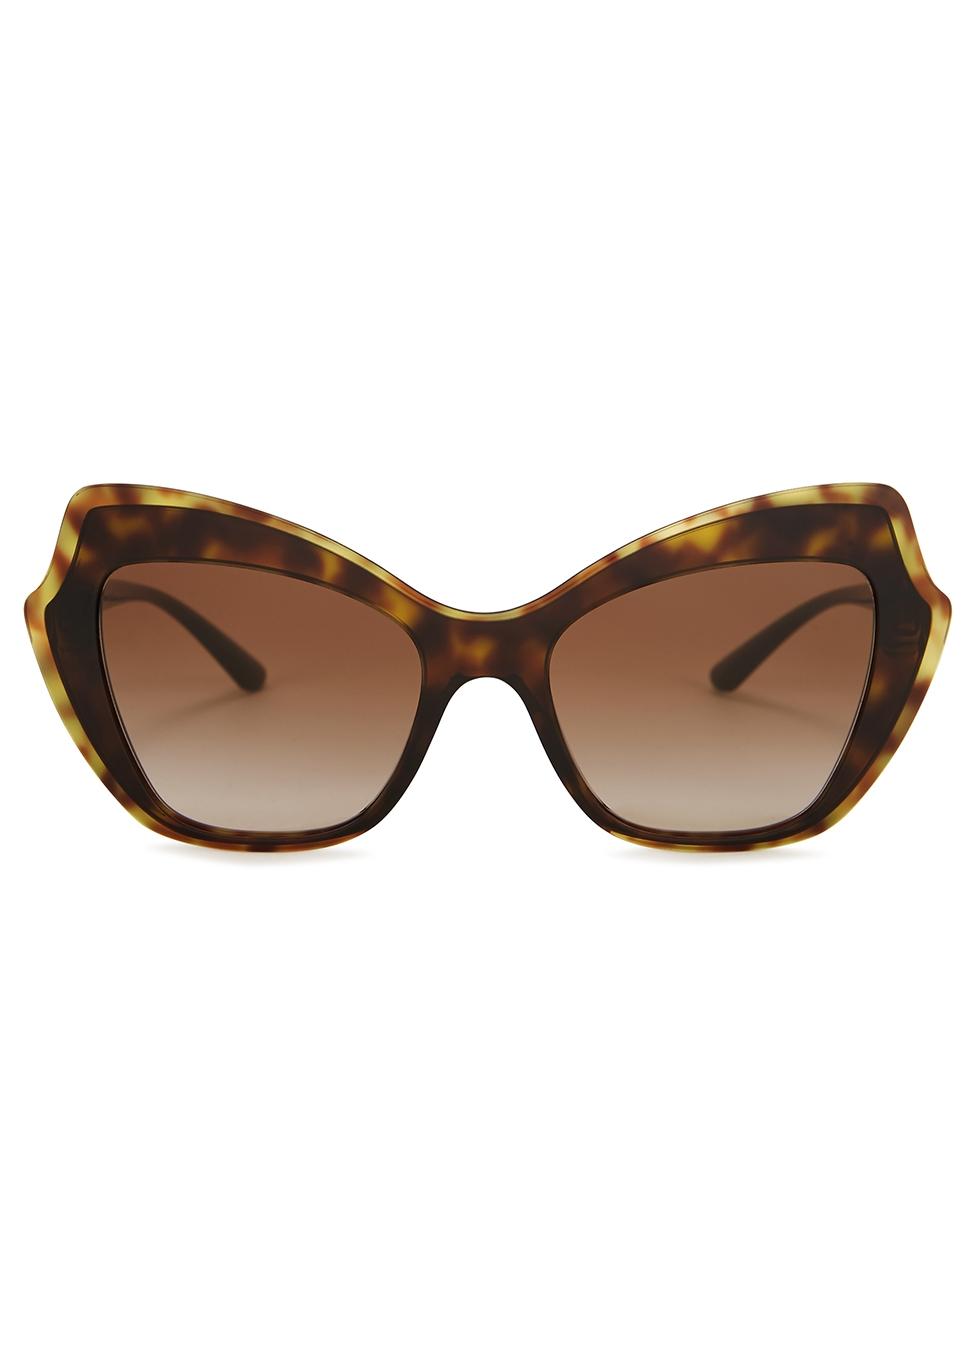 Tortoiseshell oversized cat-eye sunglasses - Dolce & Gabbana